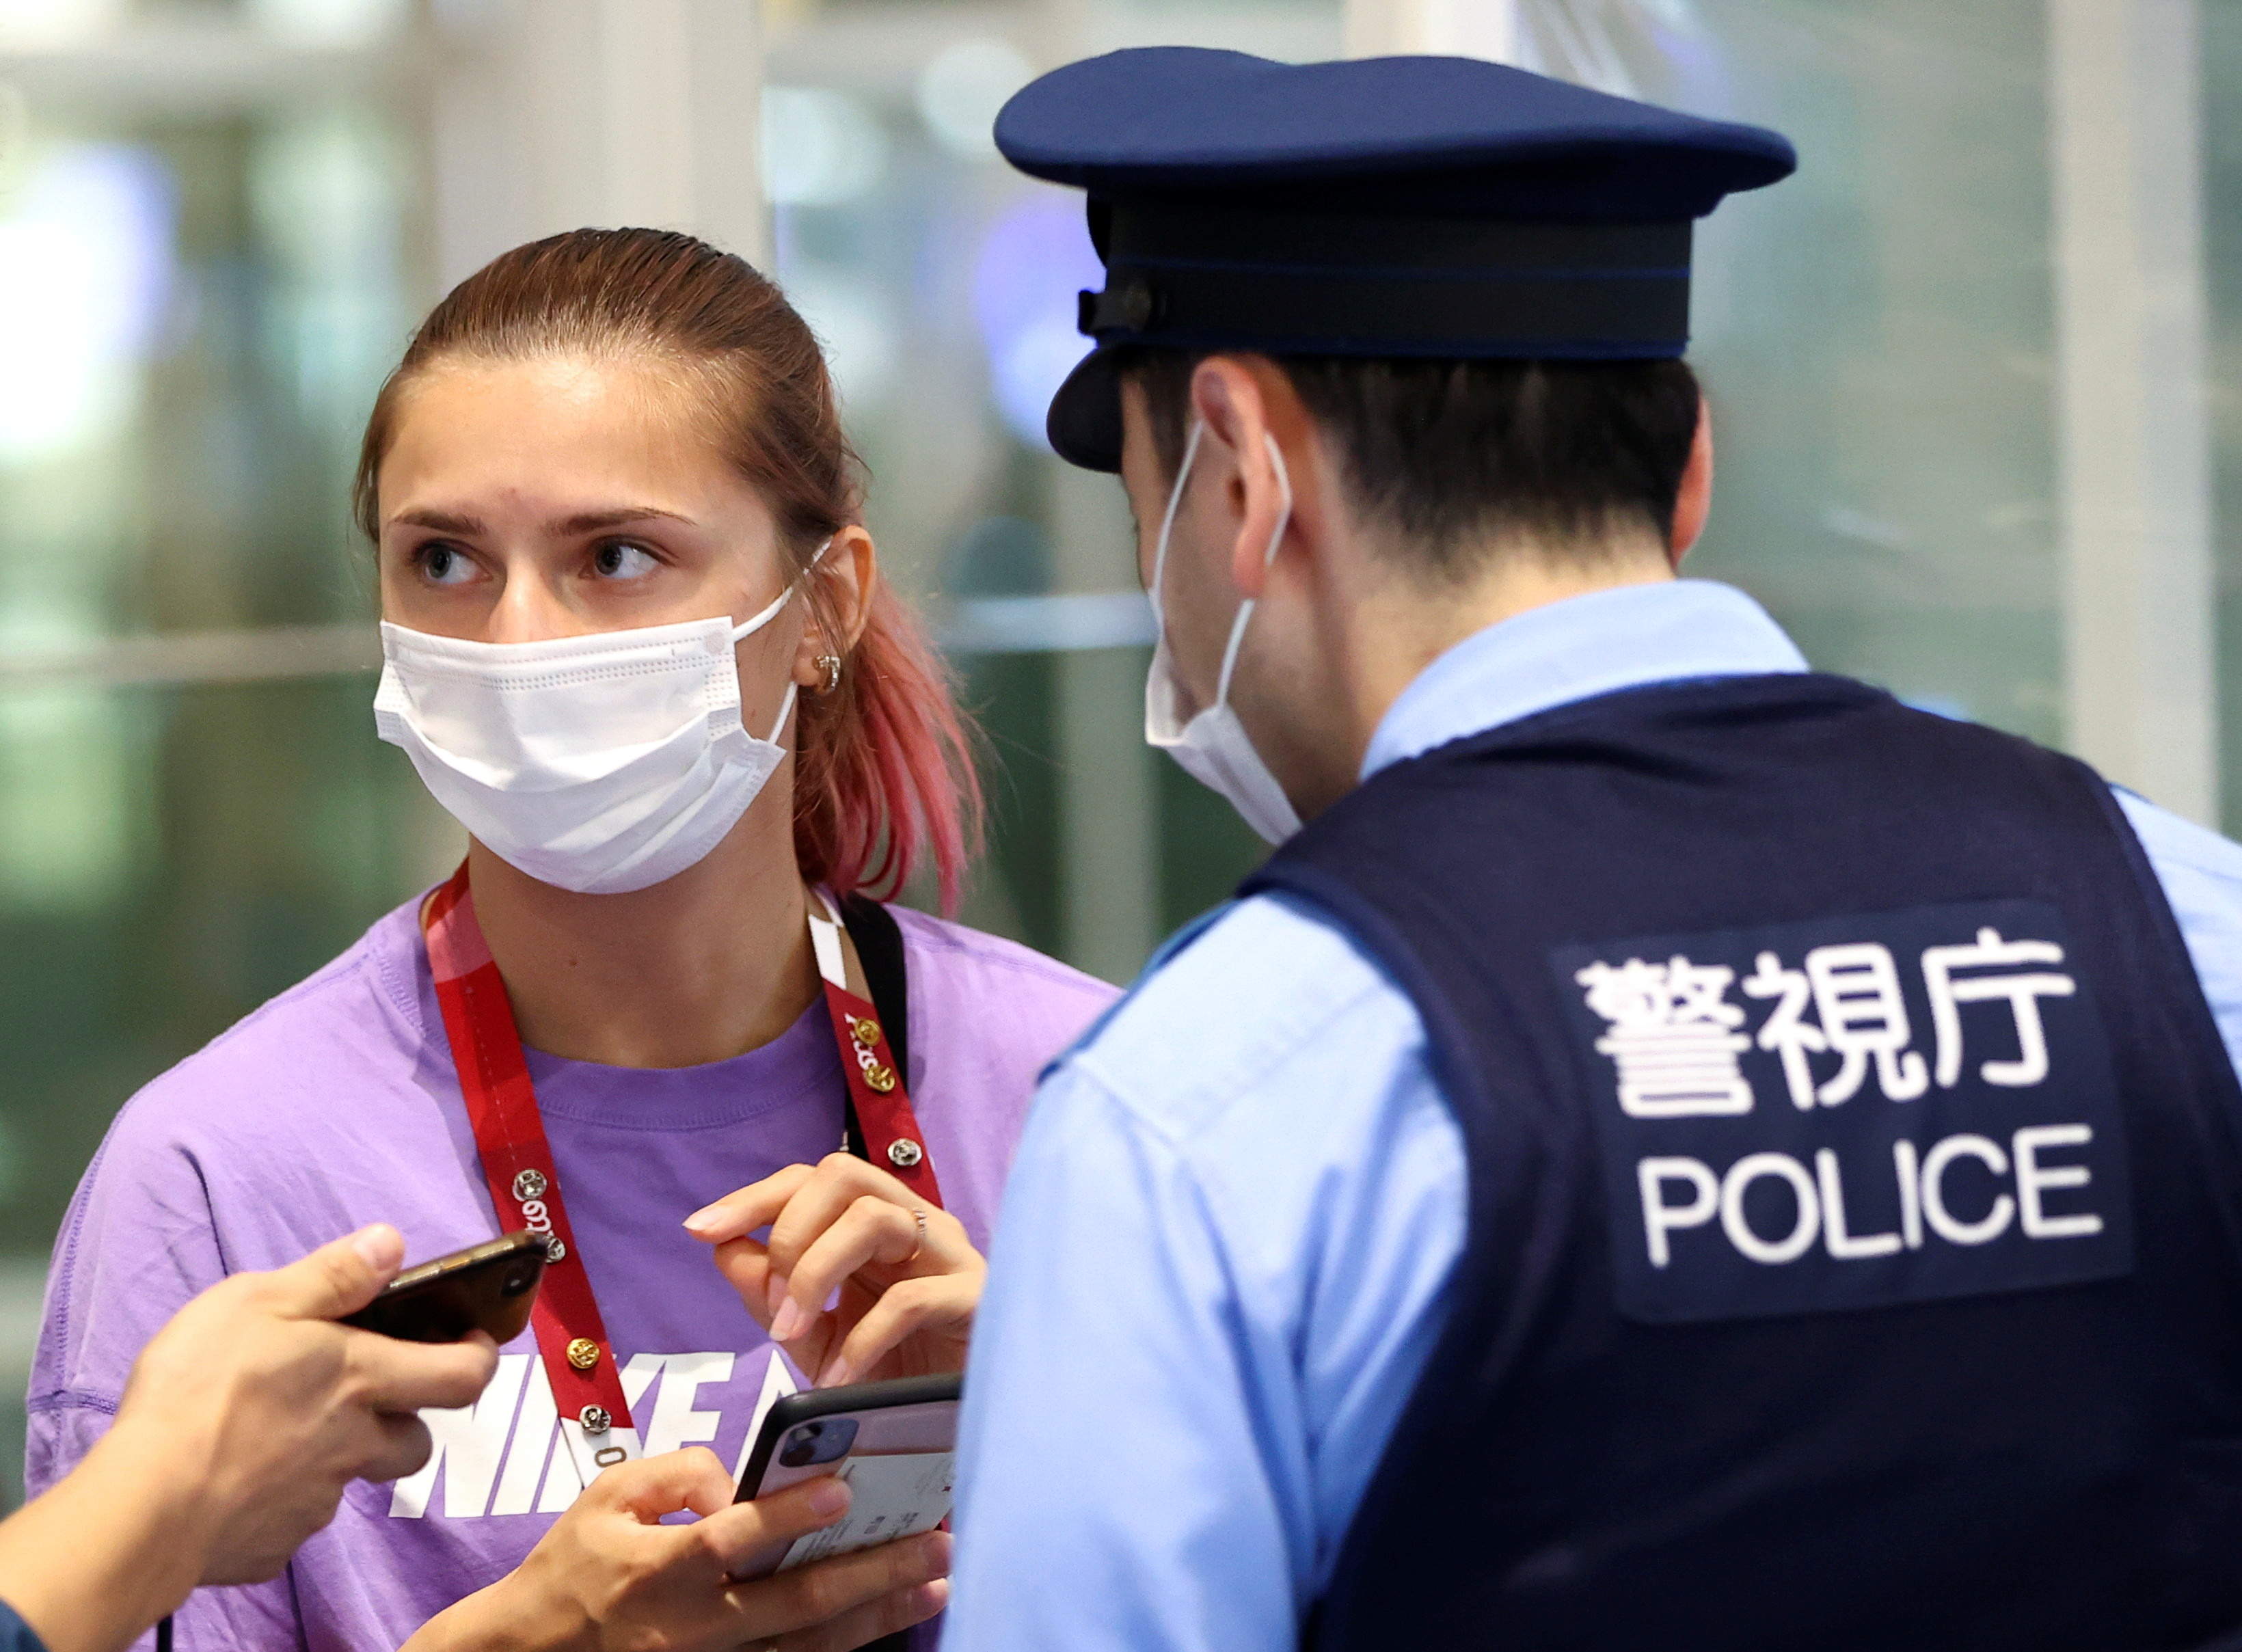 Belarusian sprinter Krystsina Tsimanouskaya talks with police officers at Haneda international airport in Tokyo, Japan August 1, 2021.  REUTERS/Issei Kato/Files